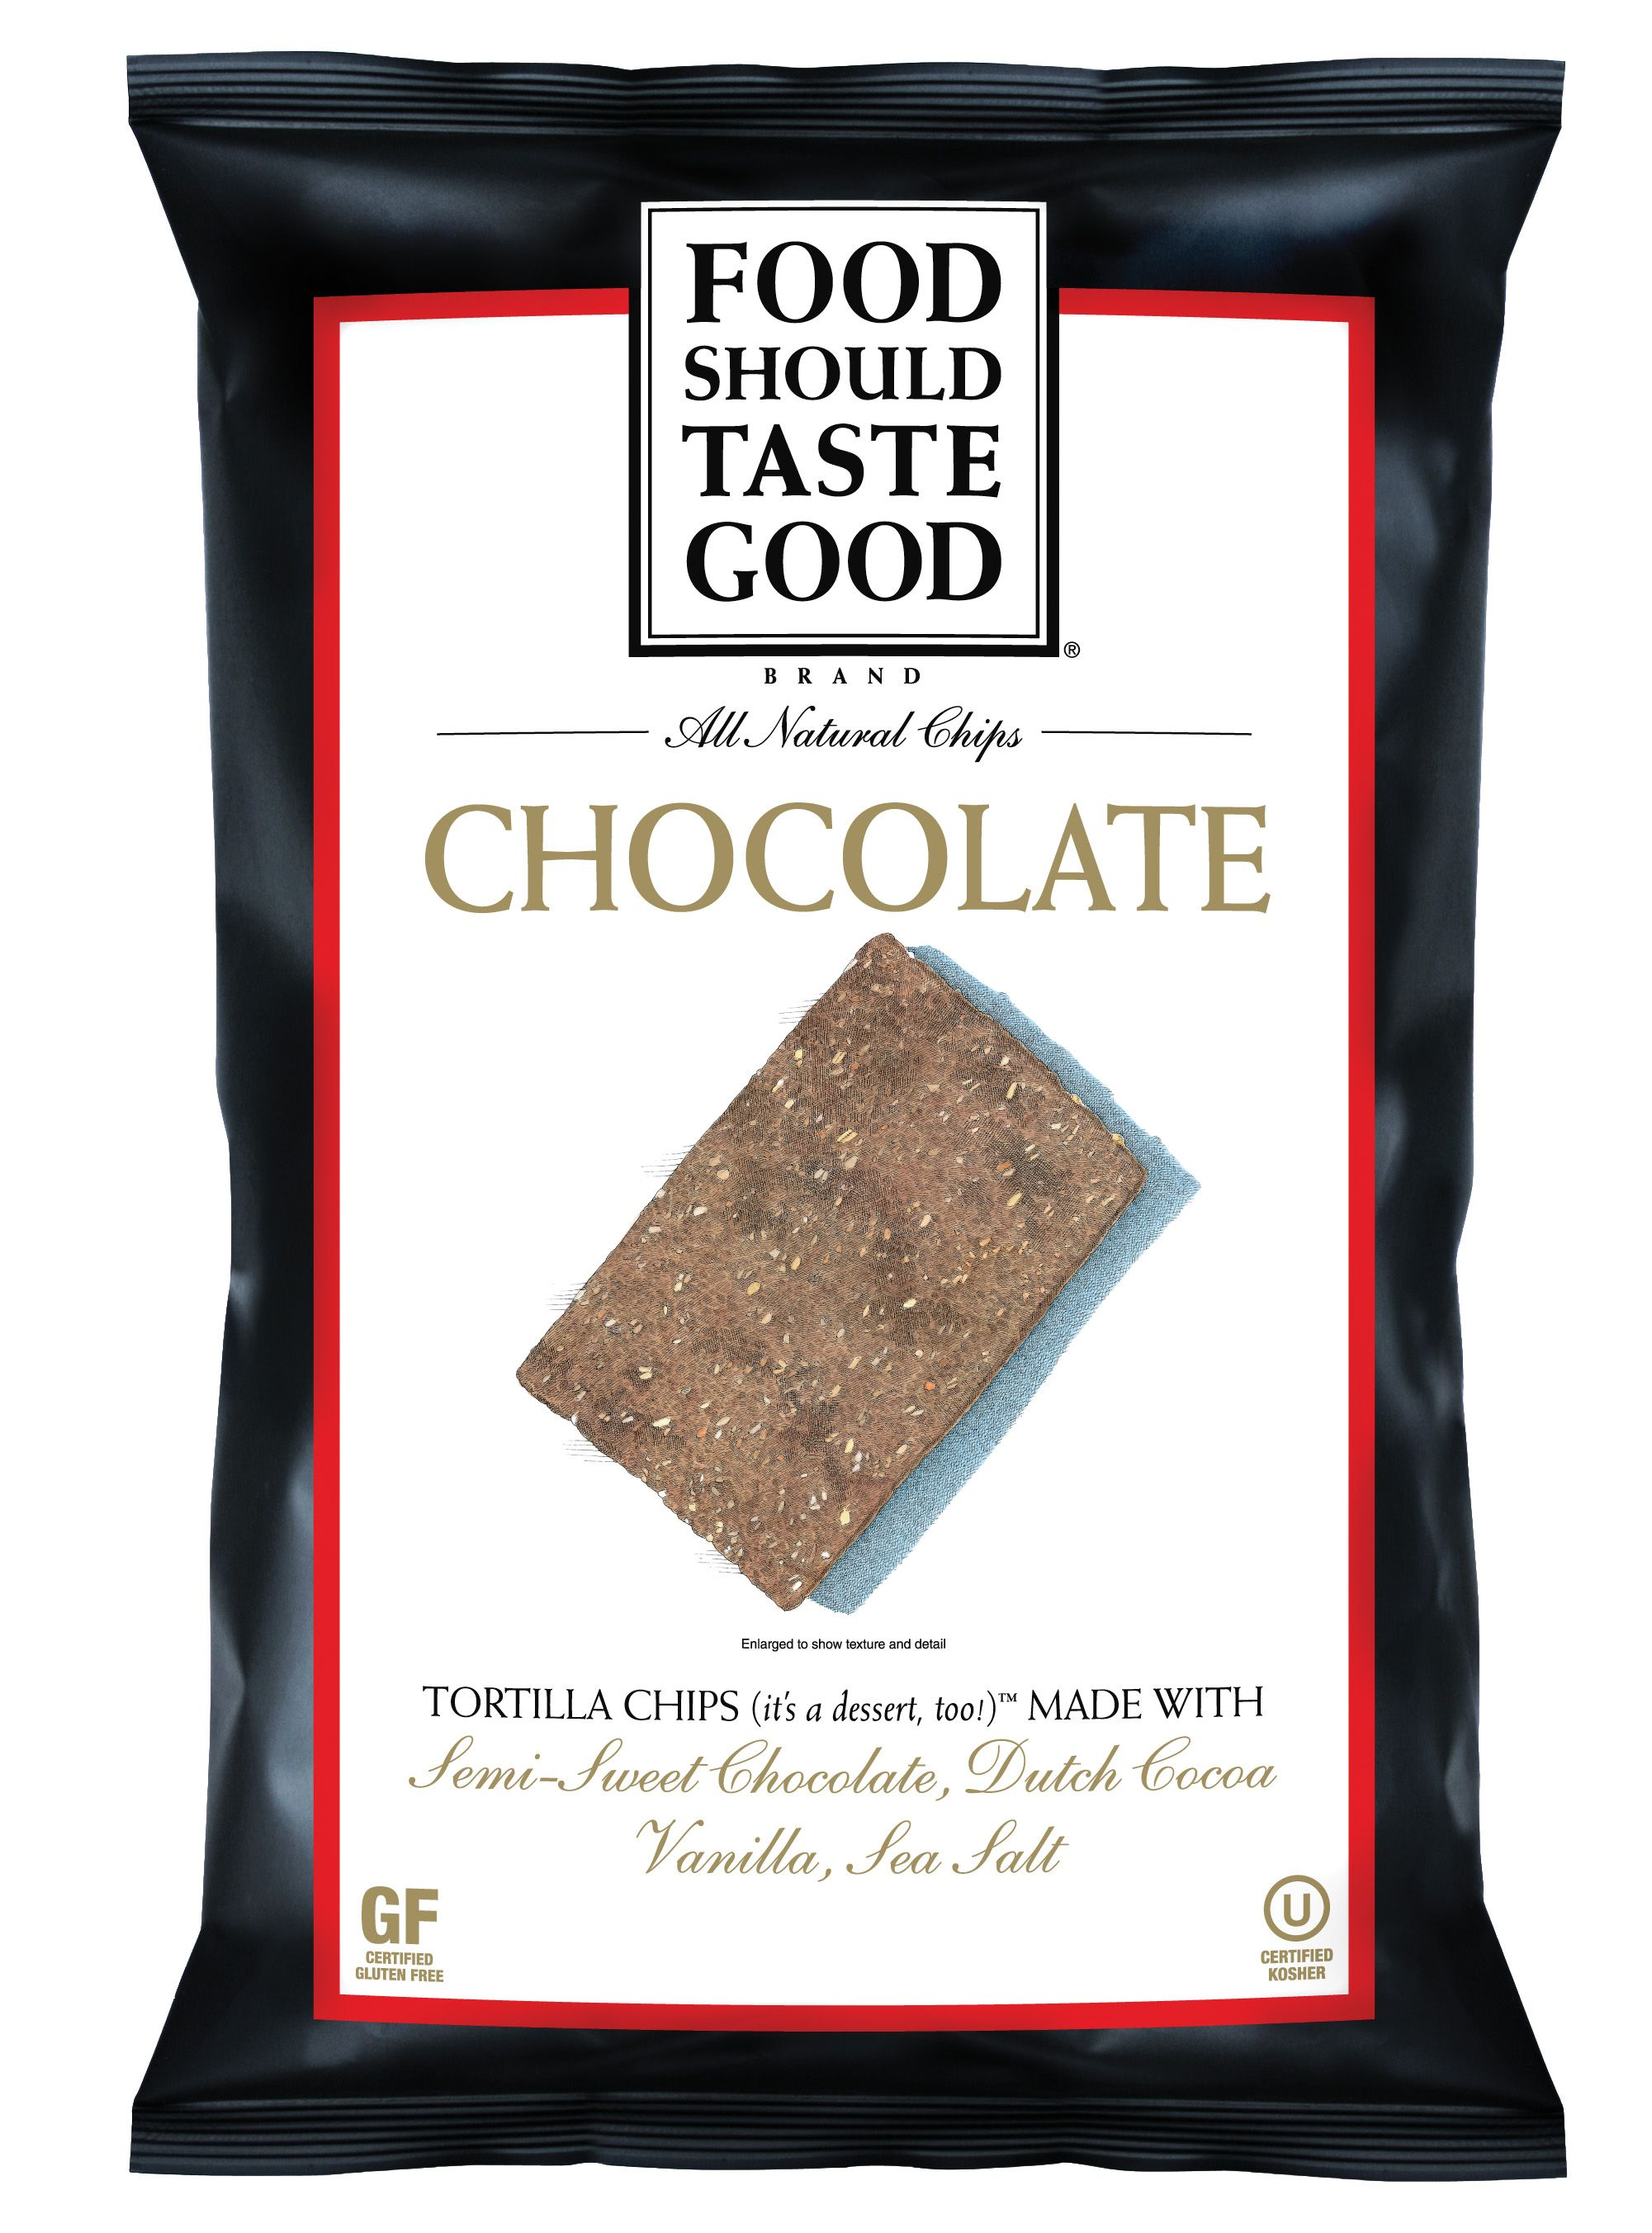 Food should taste good chocolate tortilla chips food